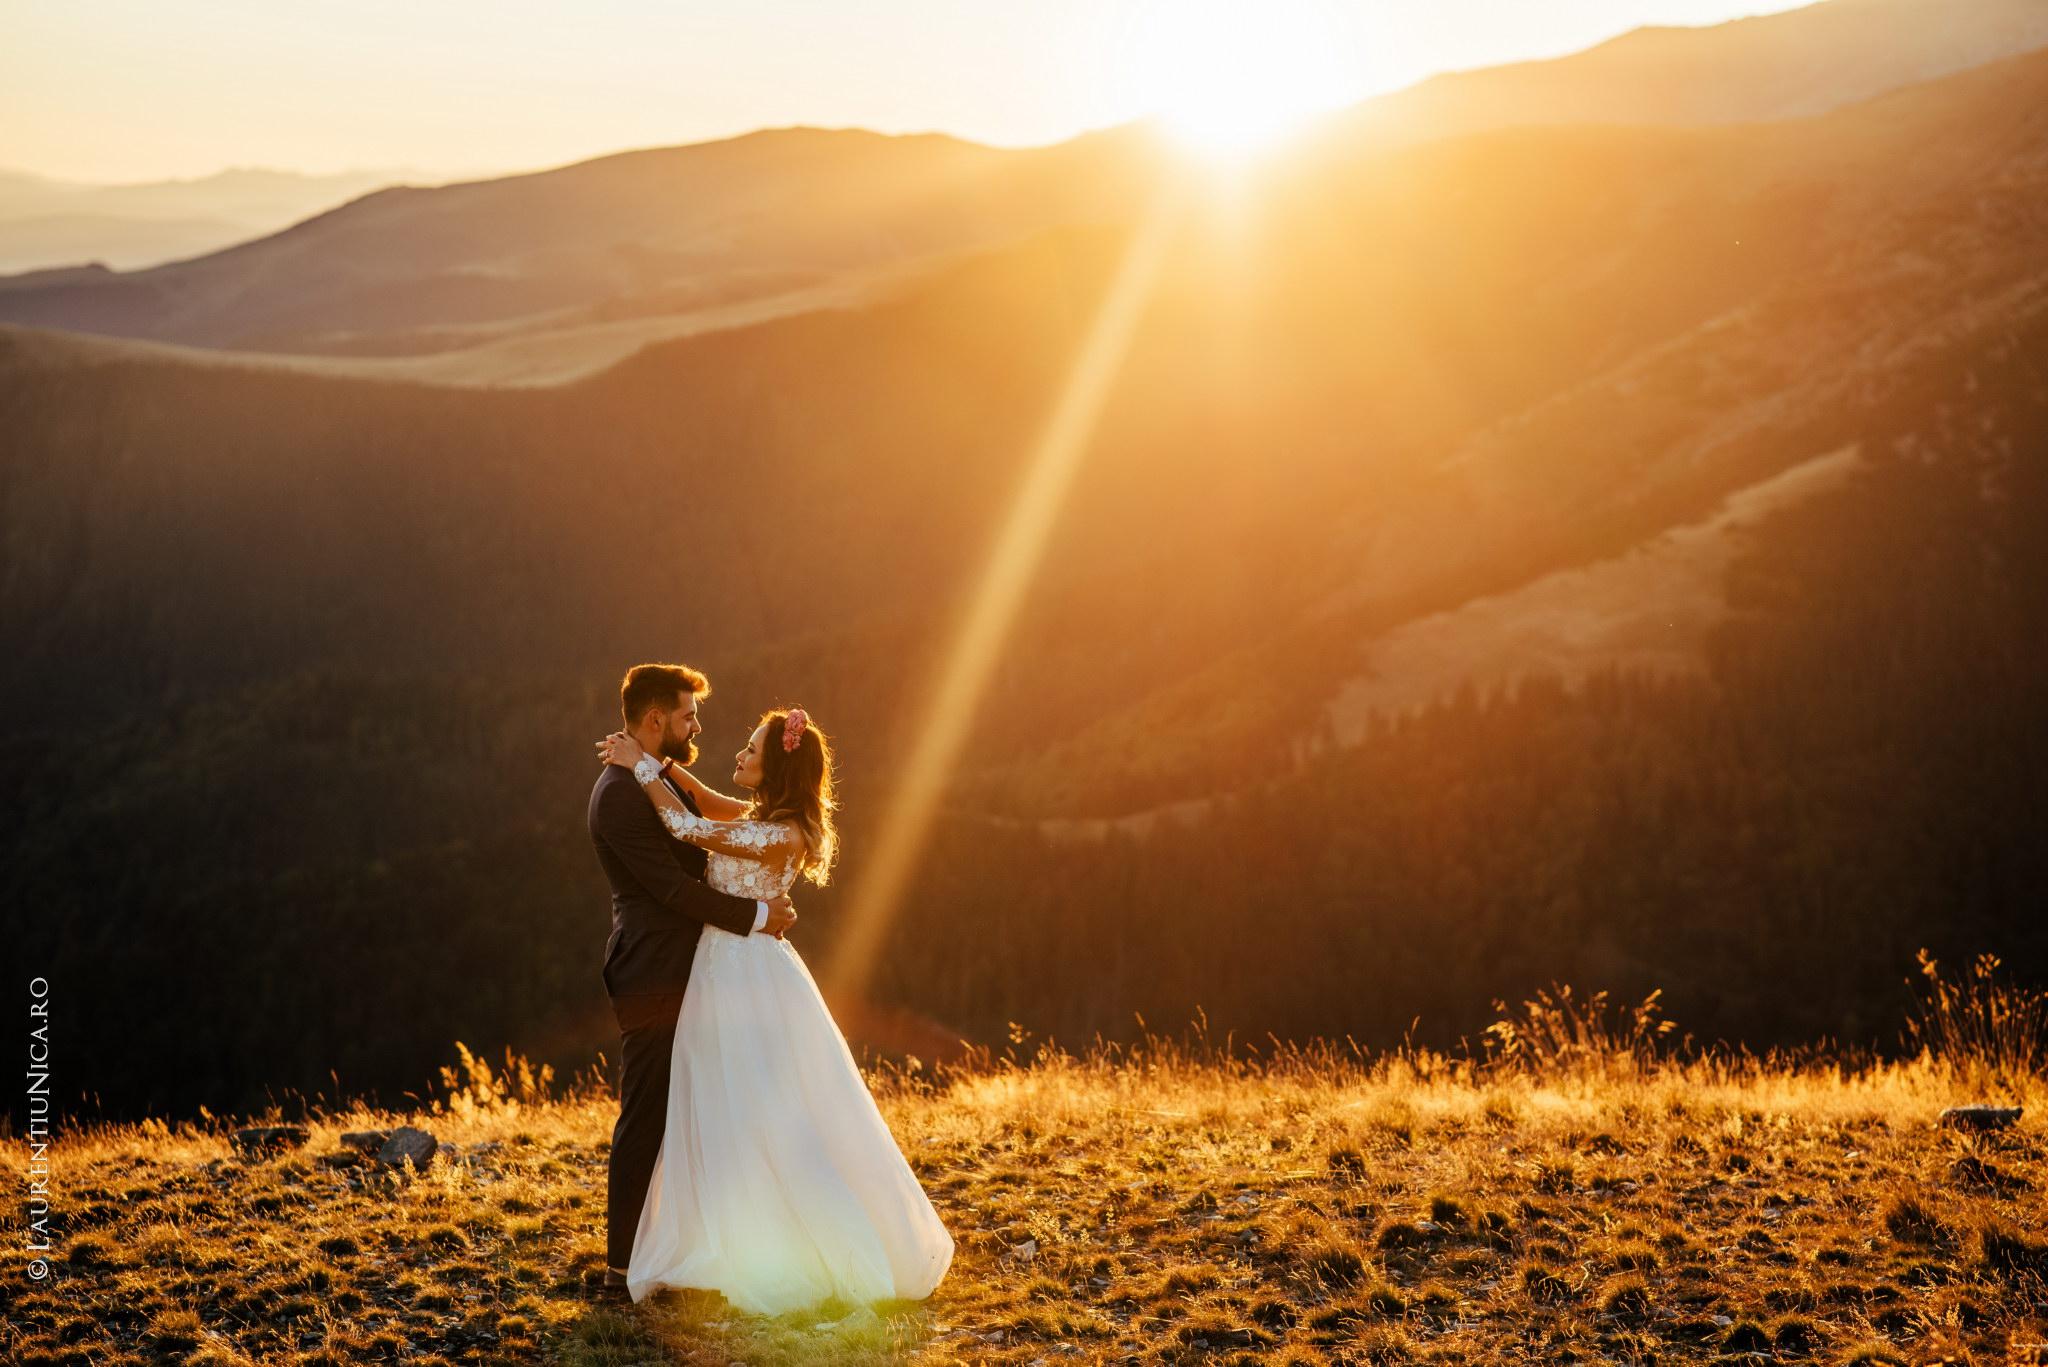 aida si alin fotograf nunta laurentiu nica transalpina 27 1 - Aida & Alin | Fotografii After Wedding | Transalpina - Muntii Parang